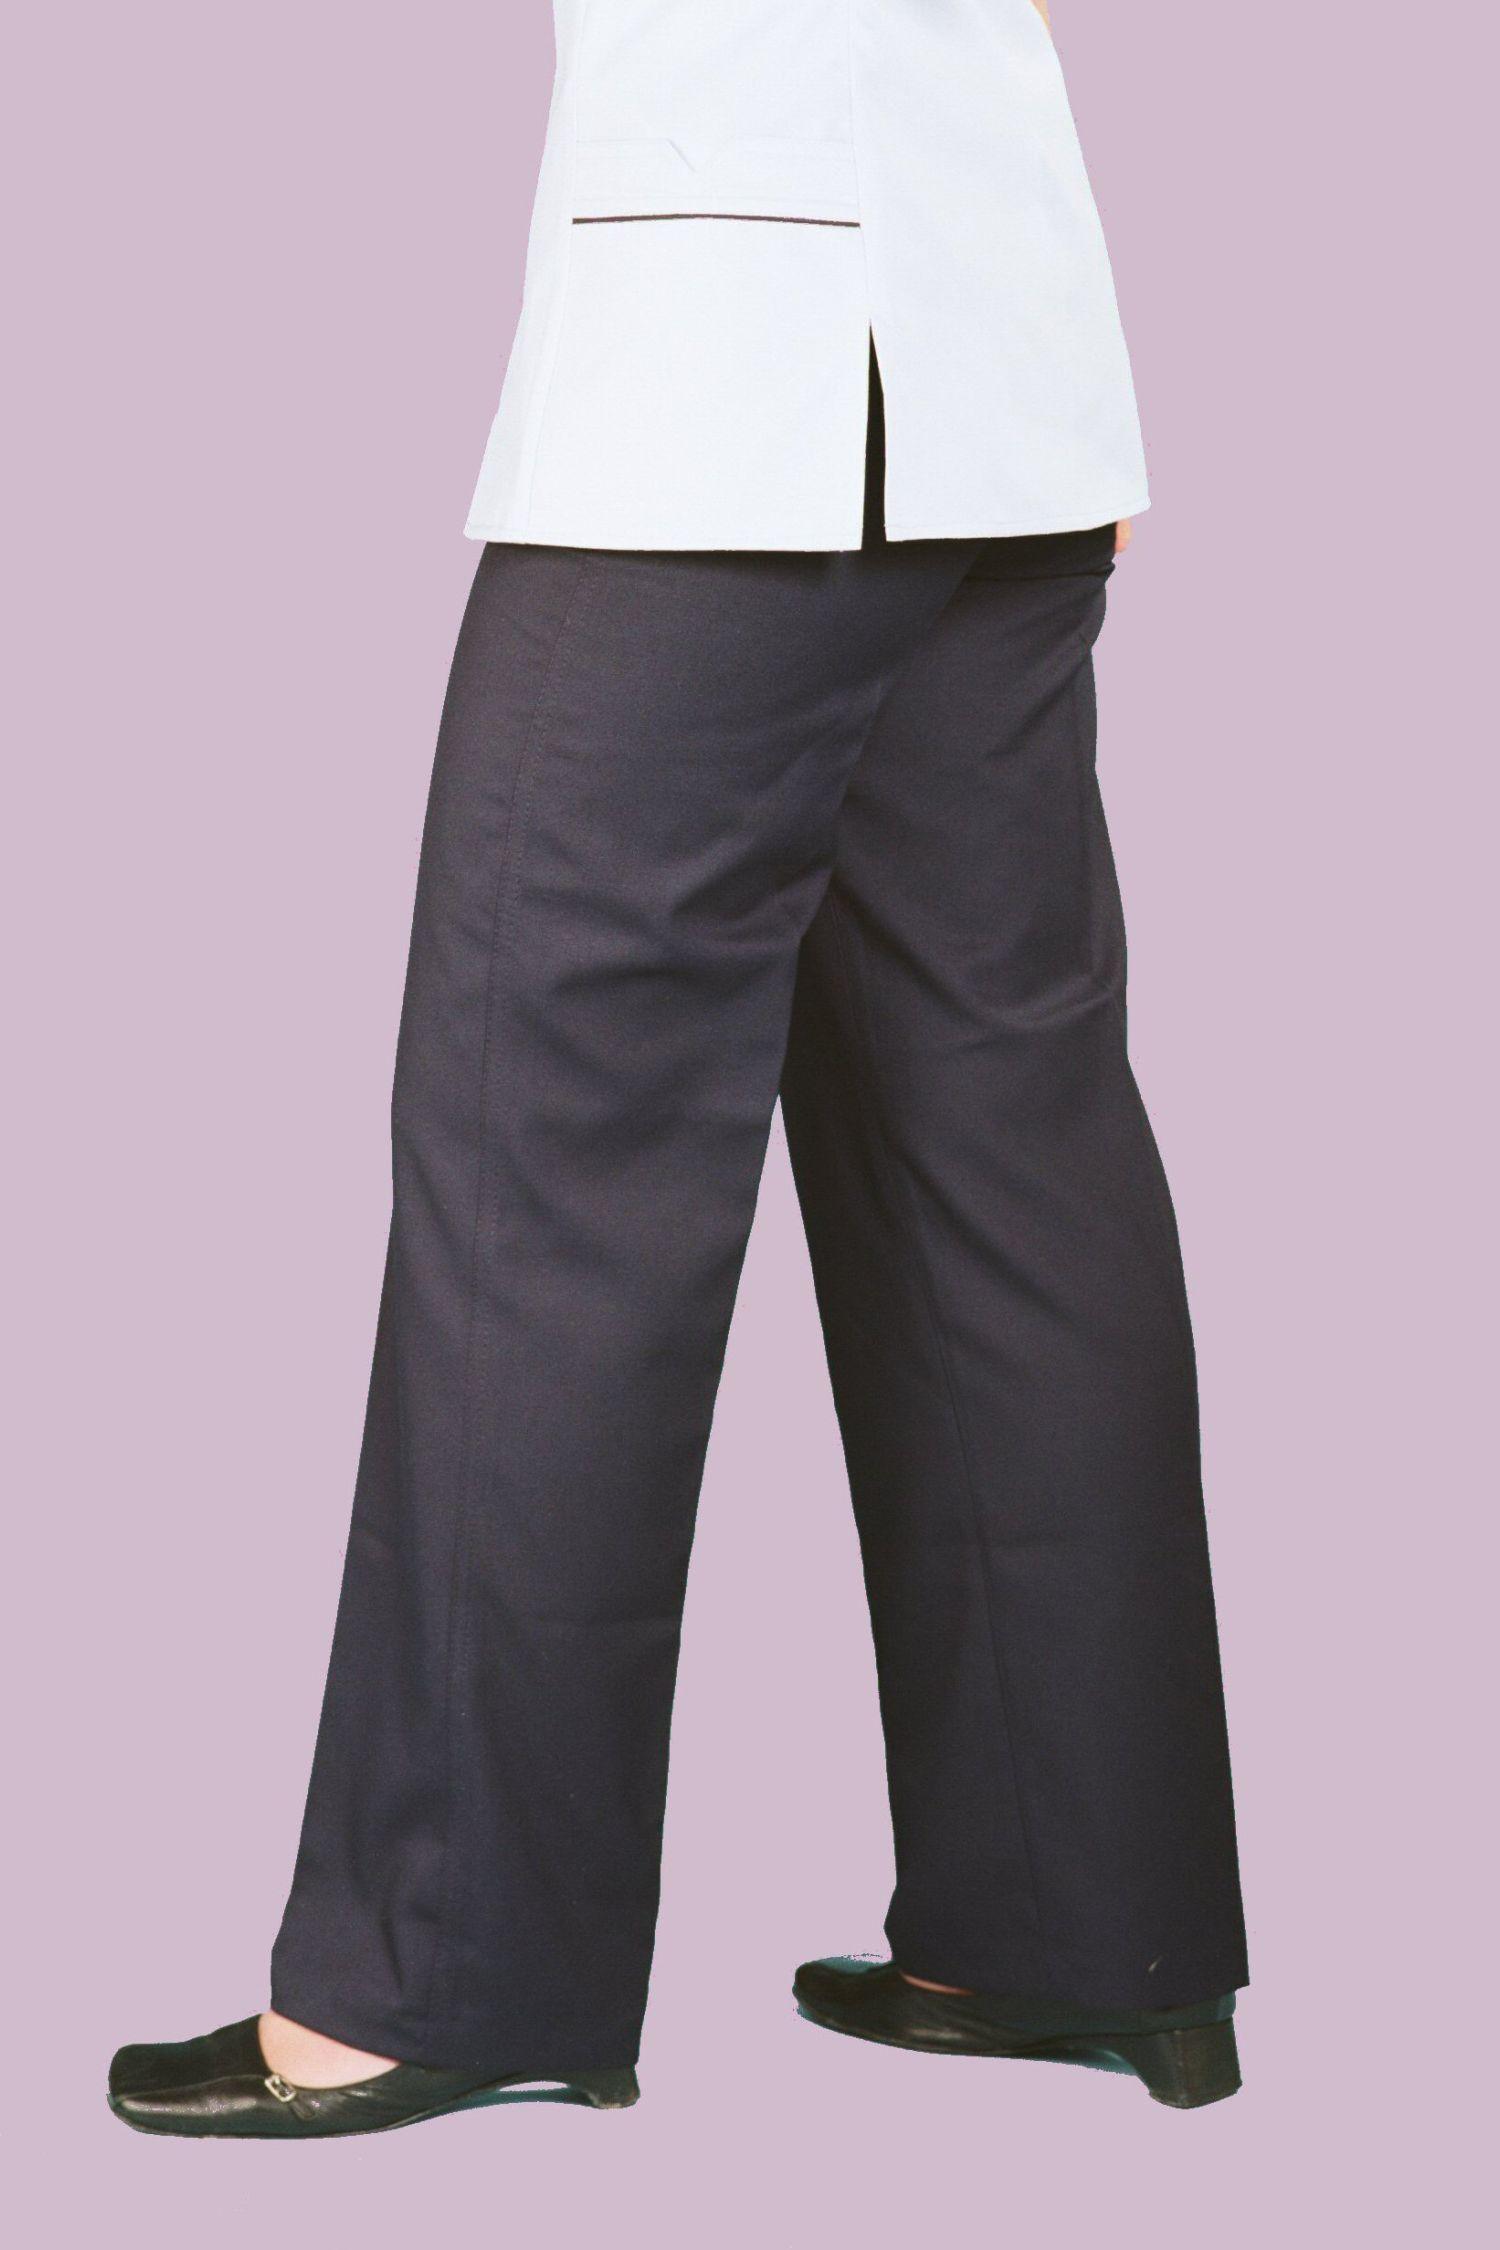 c3beba2d907 straight leg nurses trousers with flat front (SLT200) - Coppingers ...